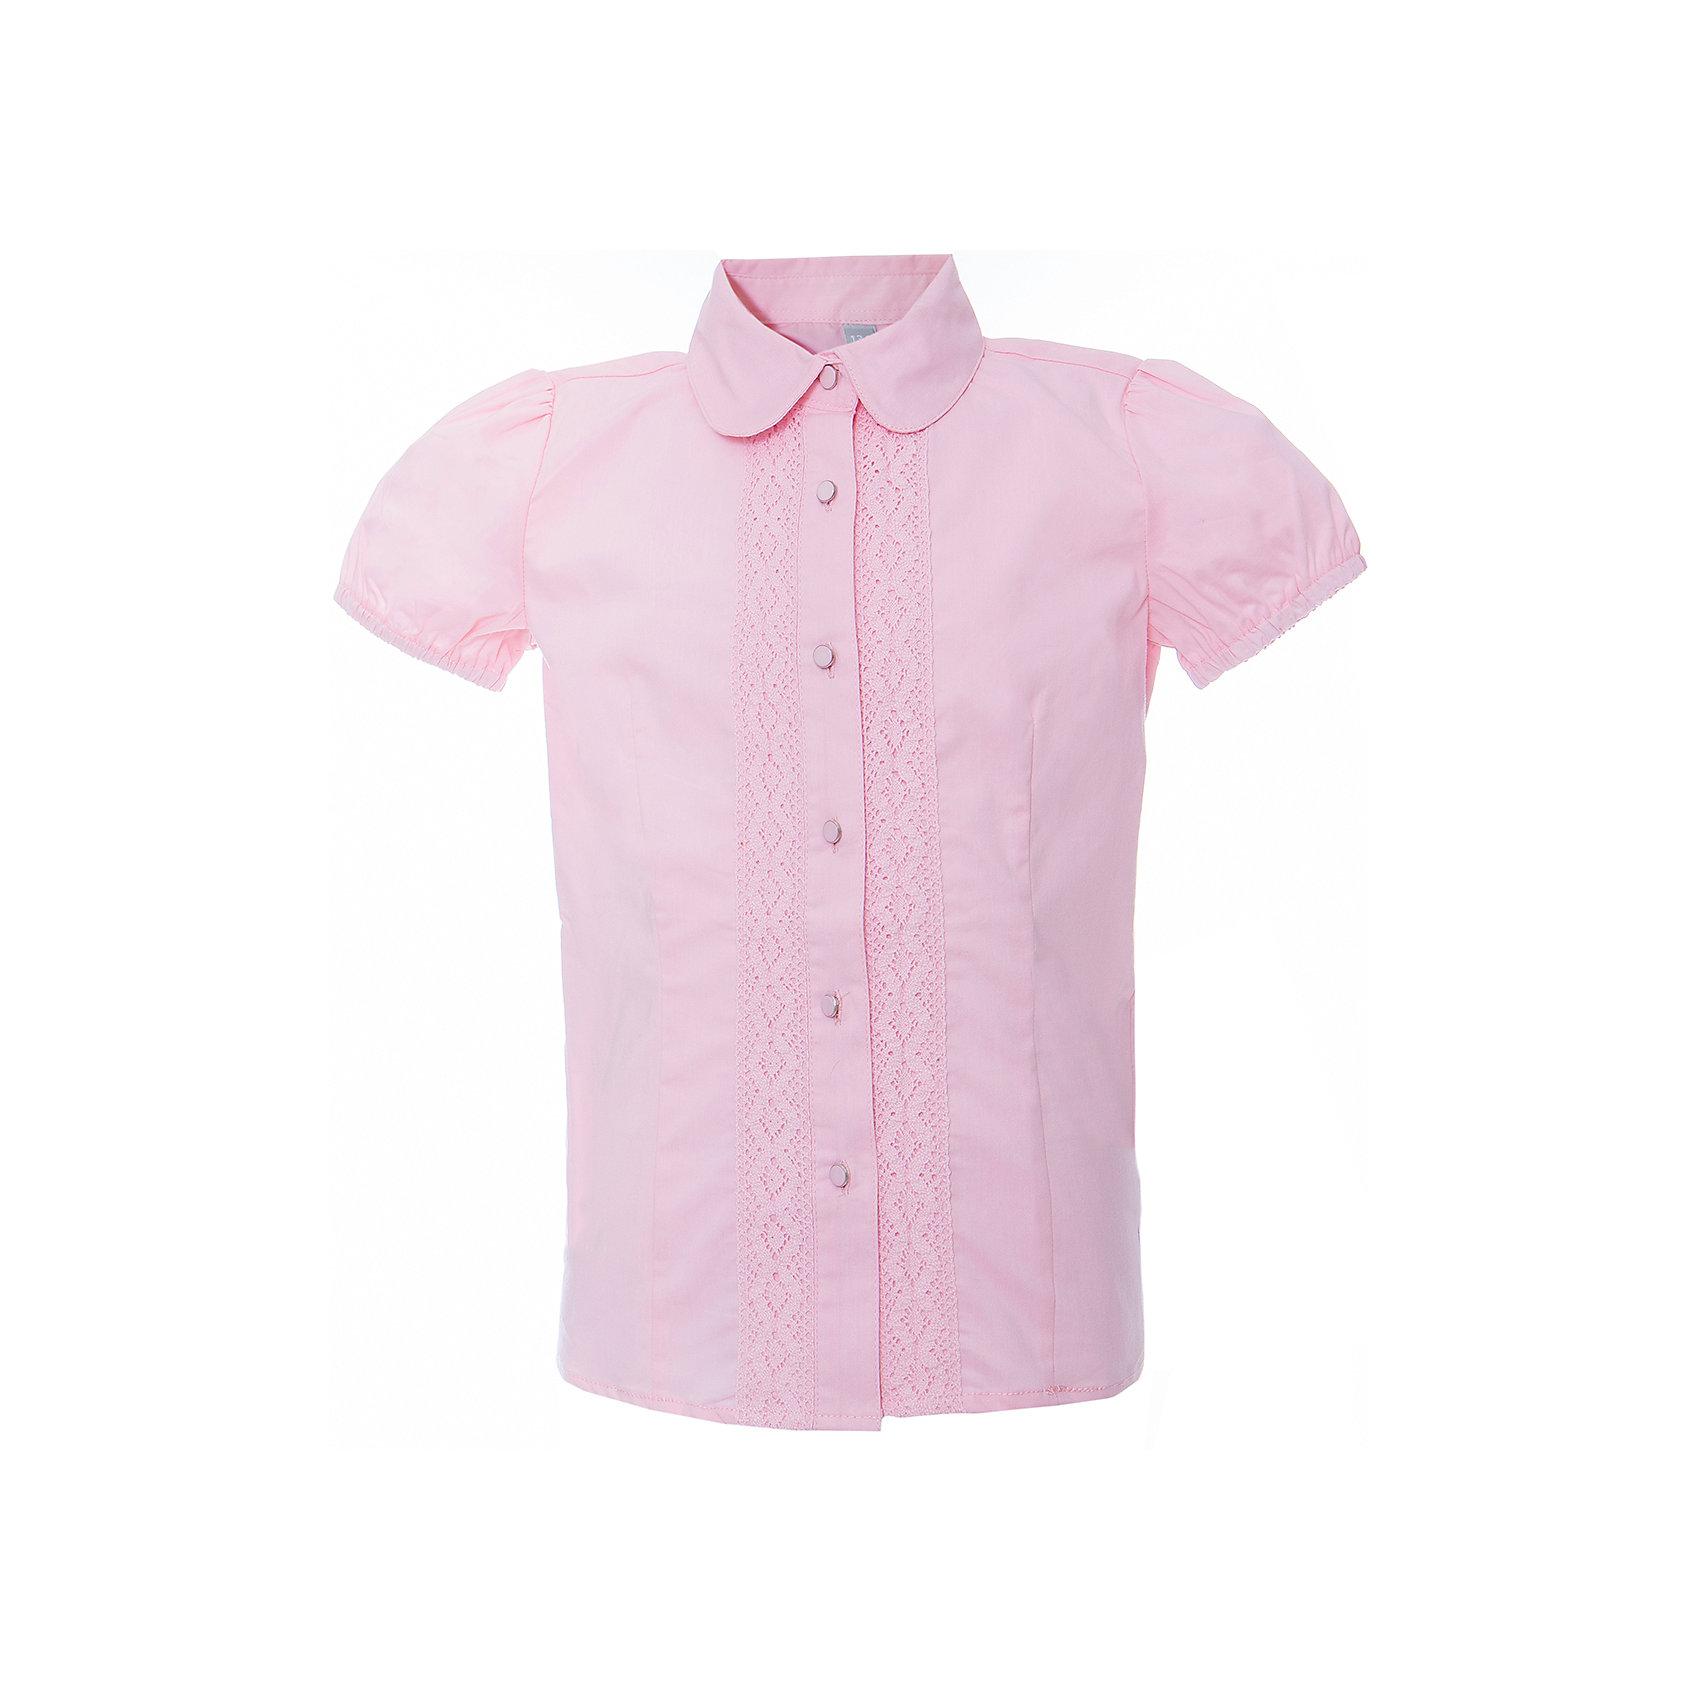 Блузка для девочки S'cool